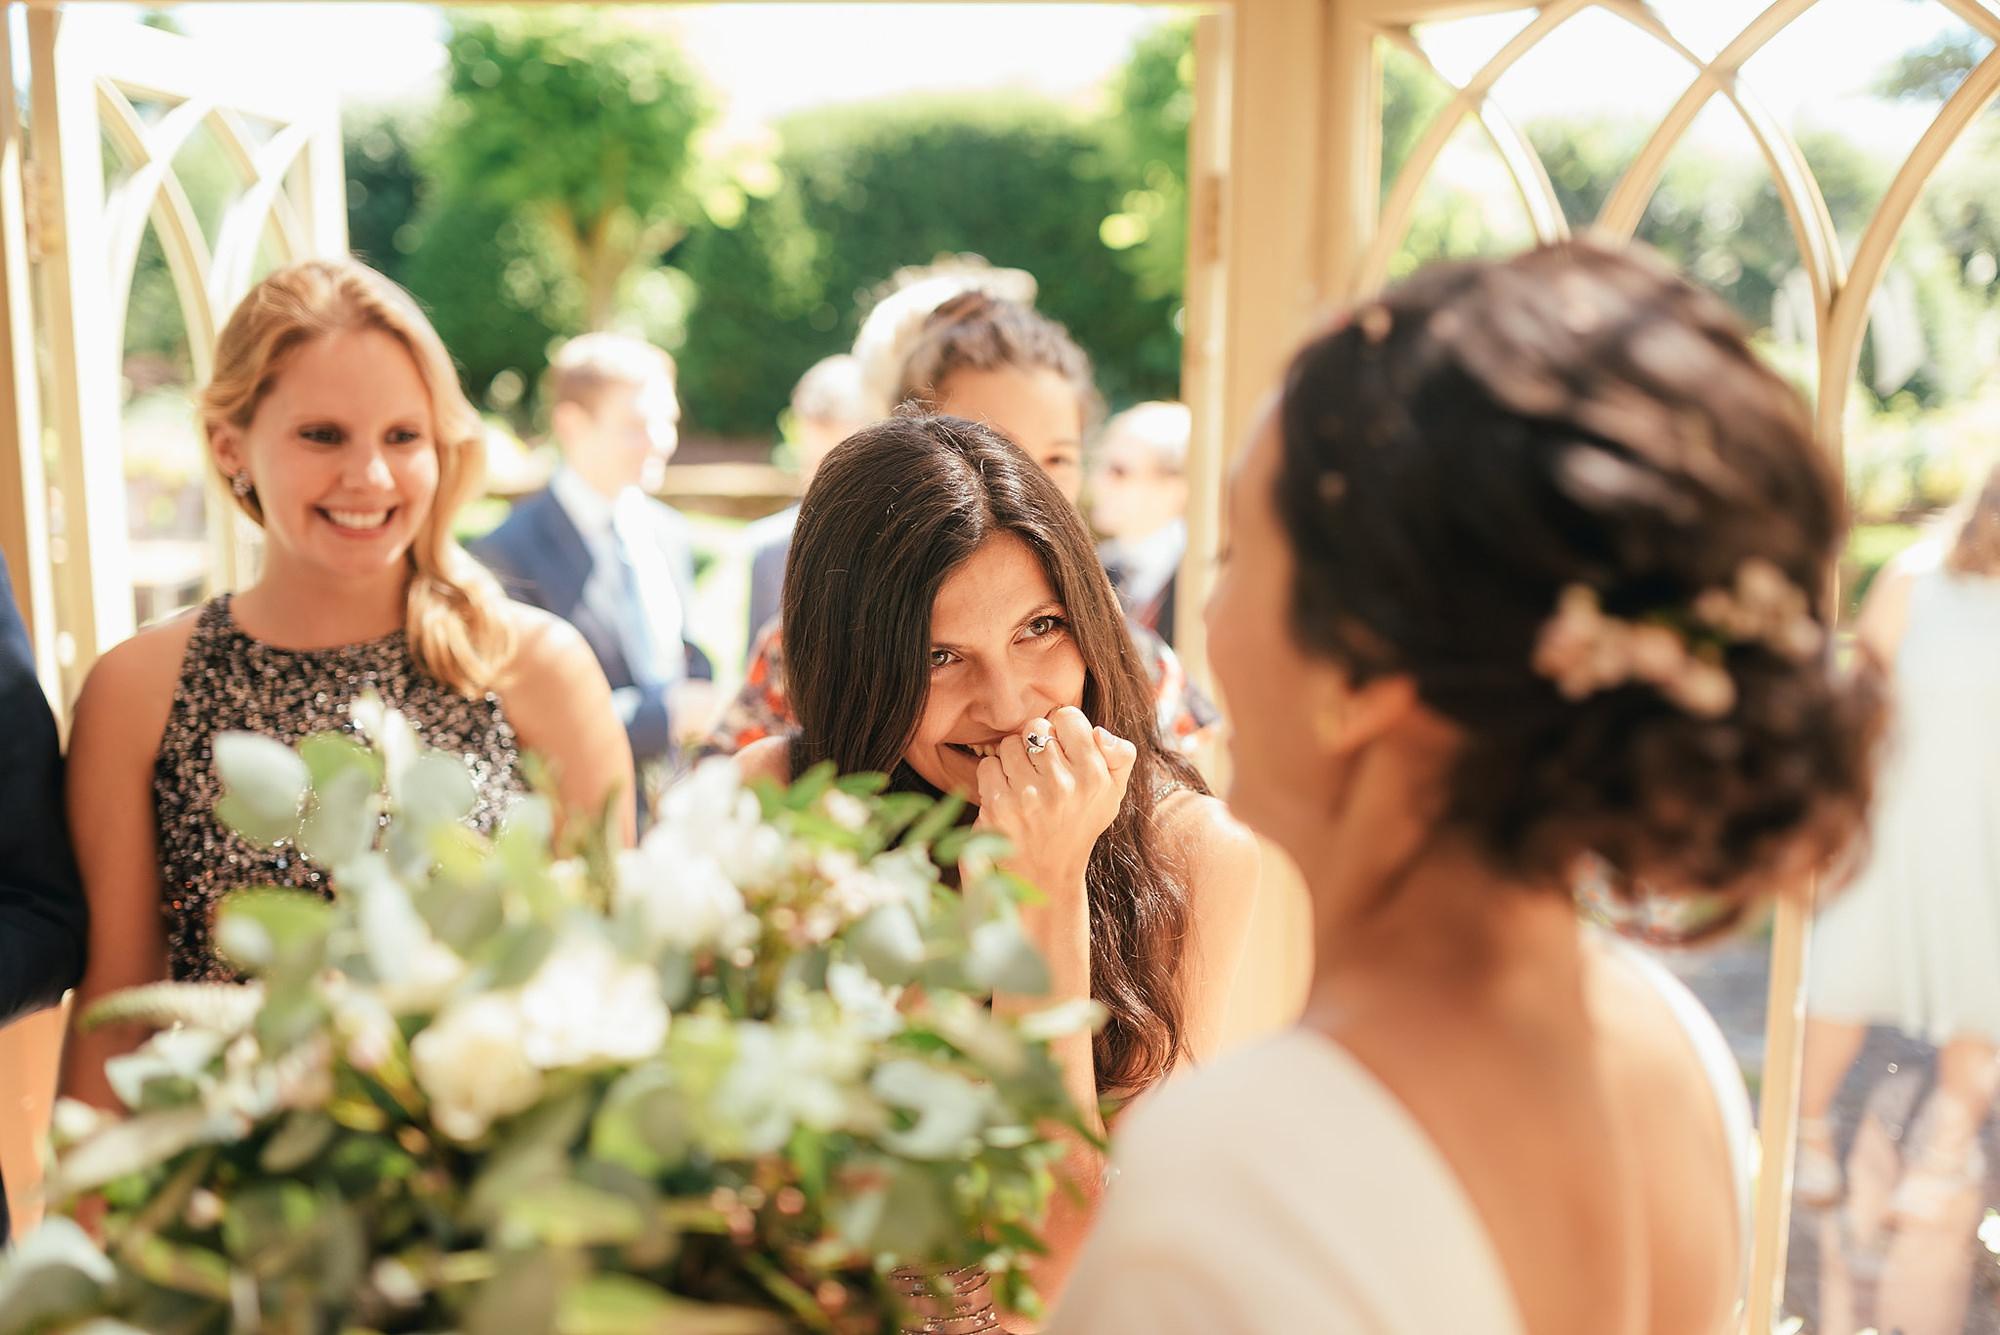 Herefordshire wedding photography